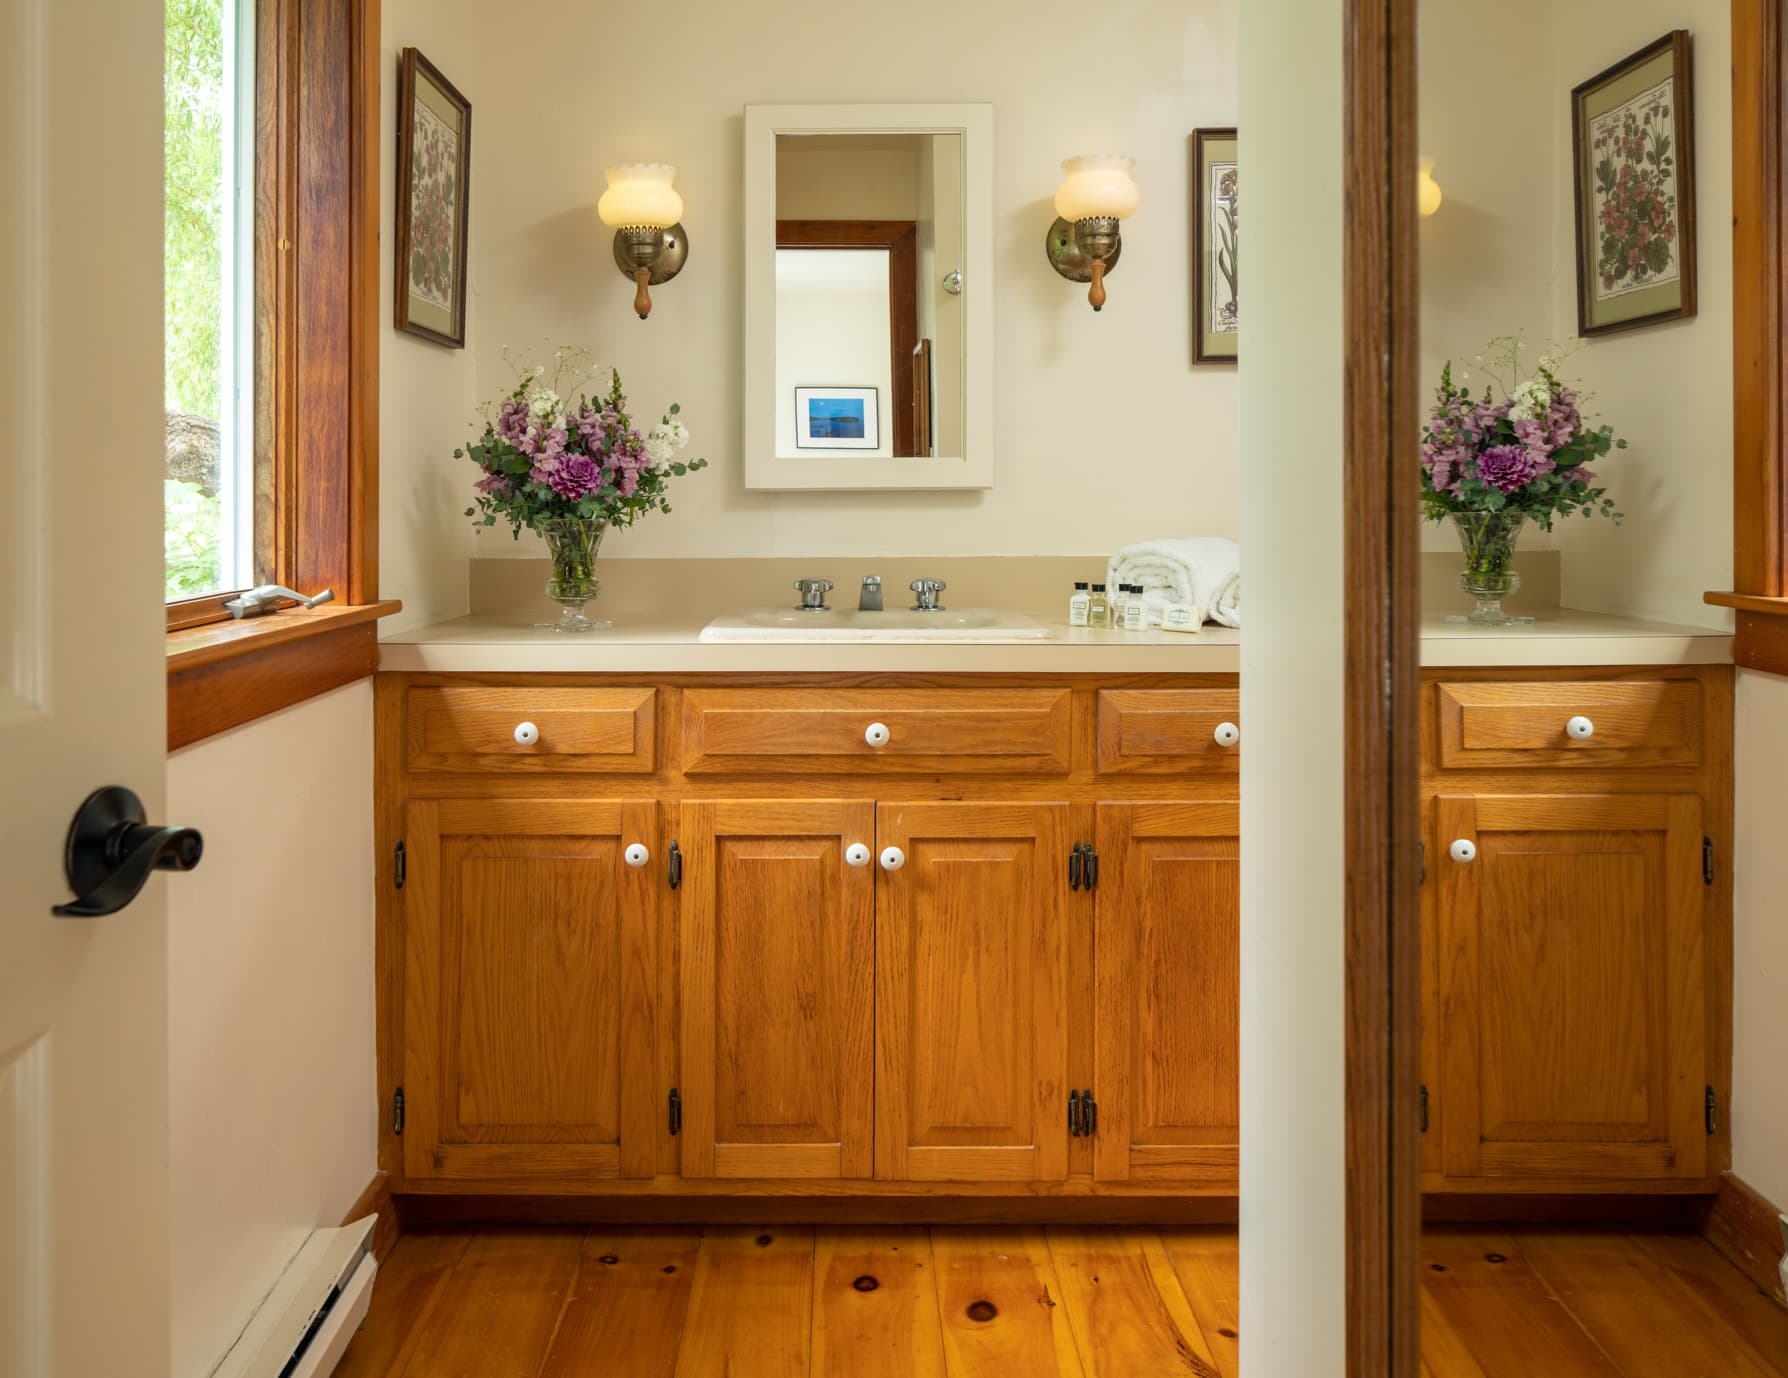 Cape House studio bathroom counter